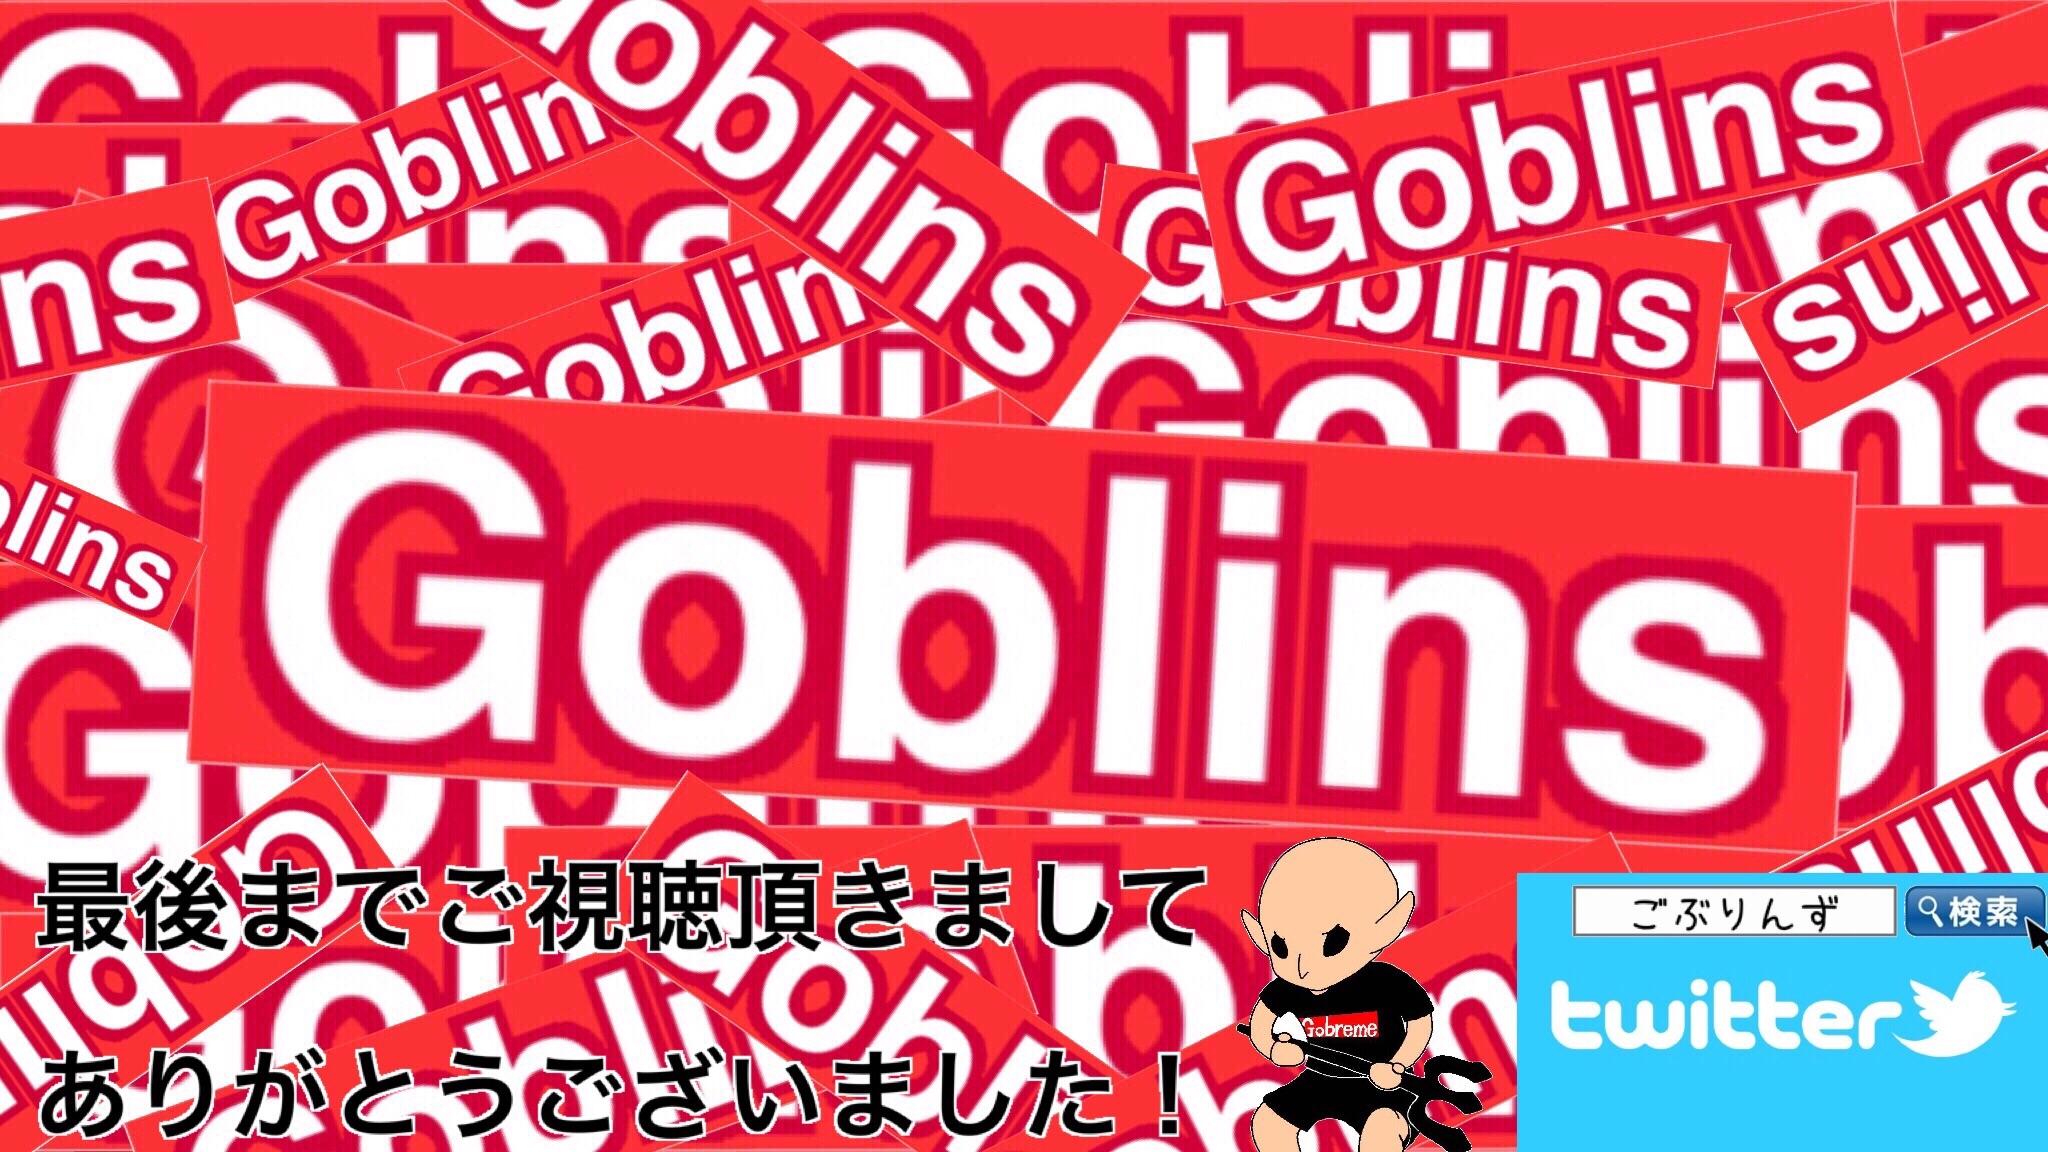 f:id:GoblinsTV:20190225095033j:image